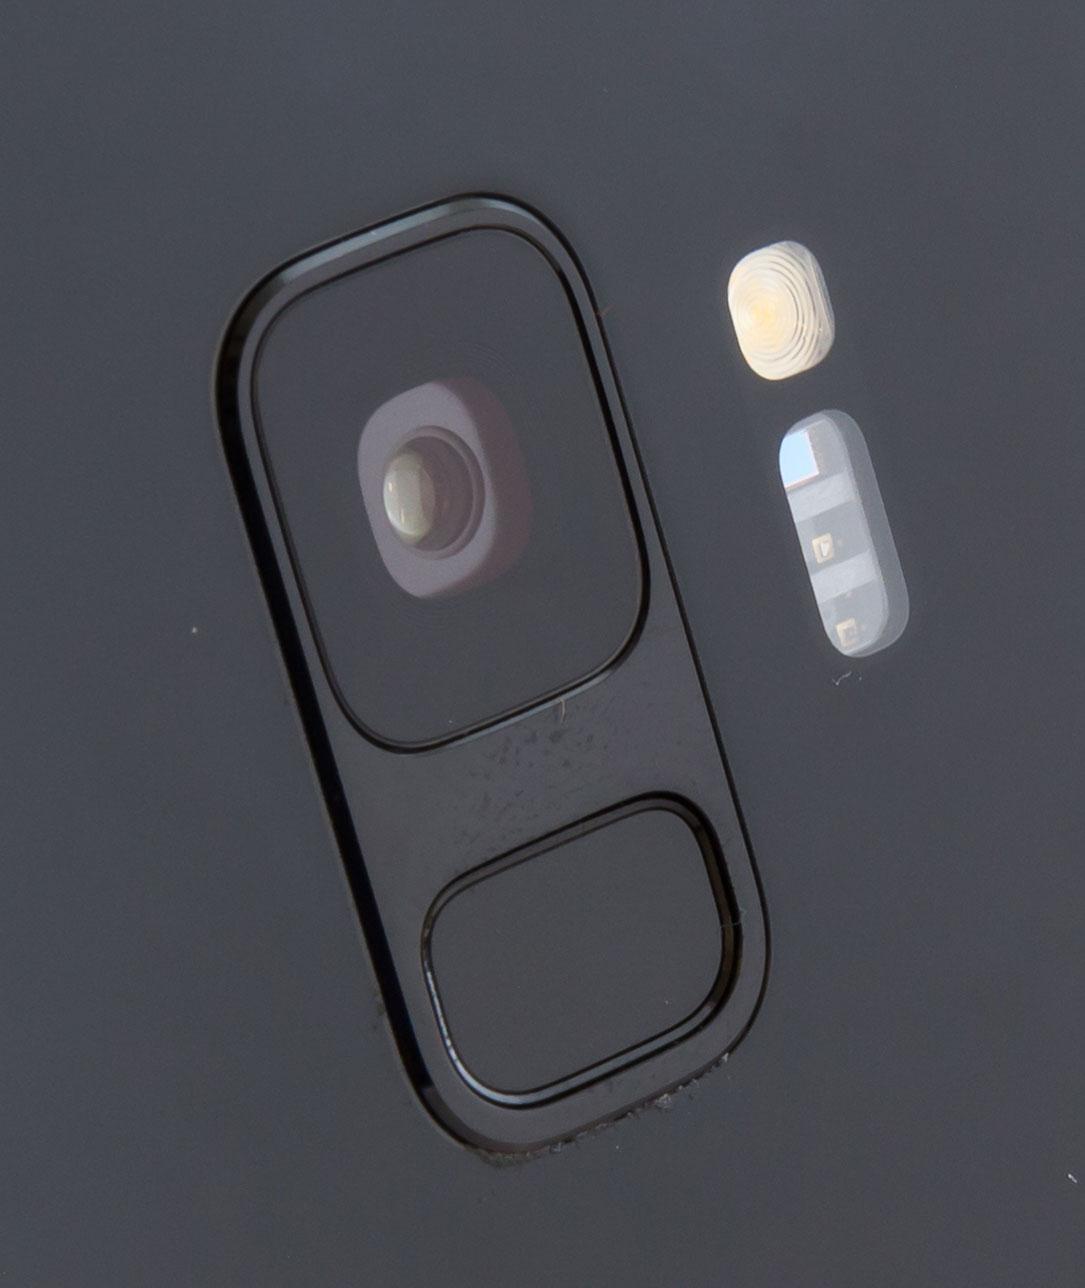 Sansung Galaxy S9 2